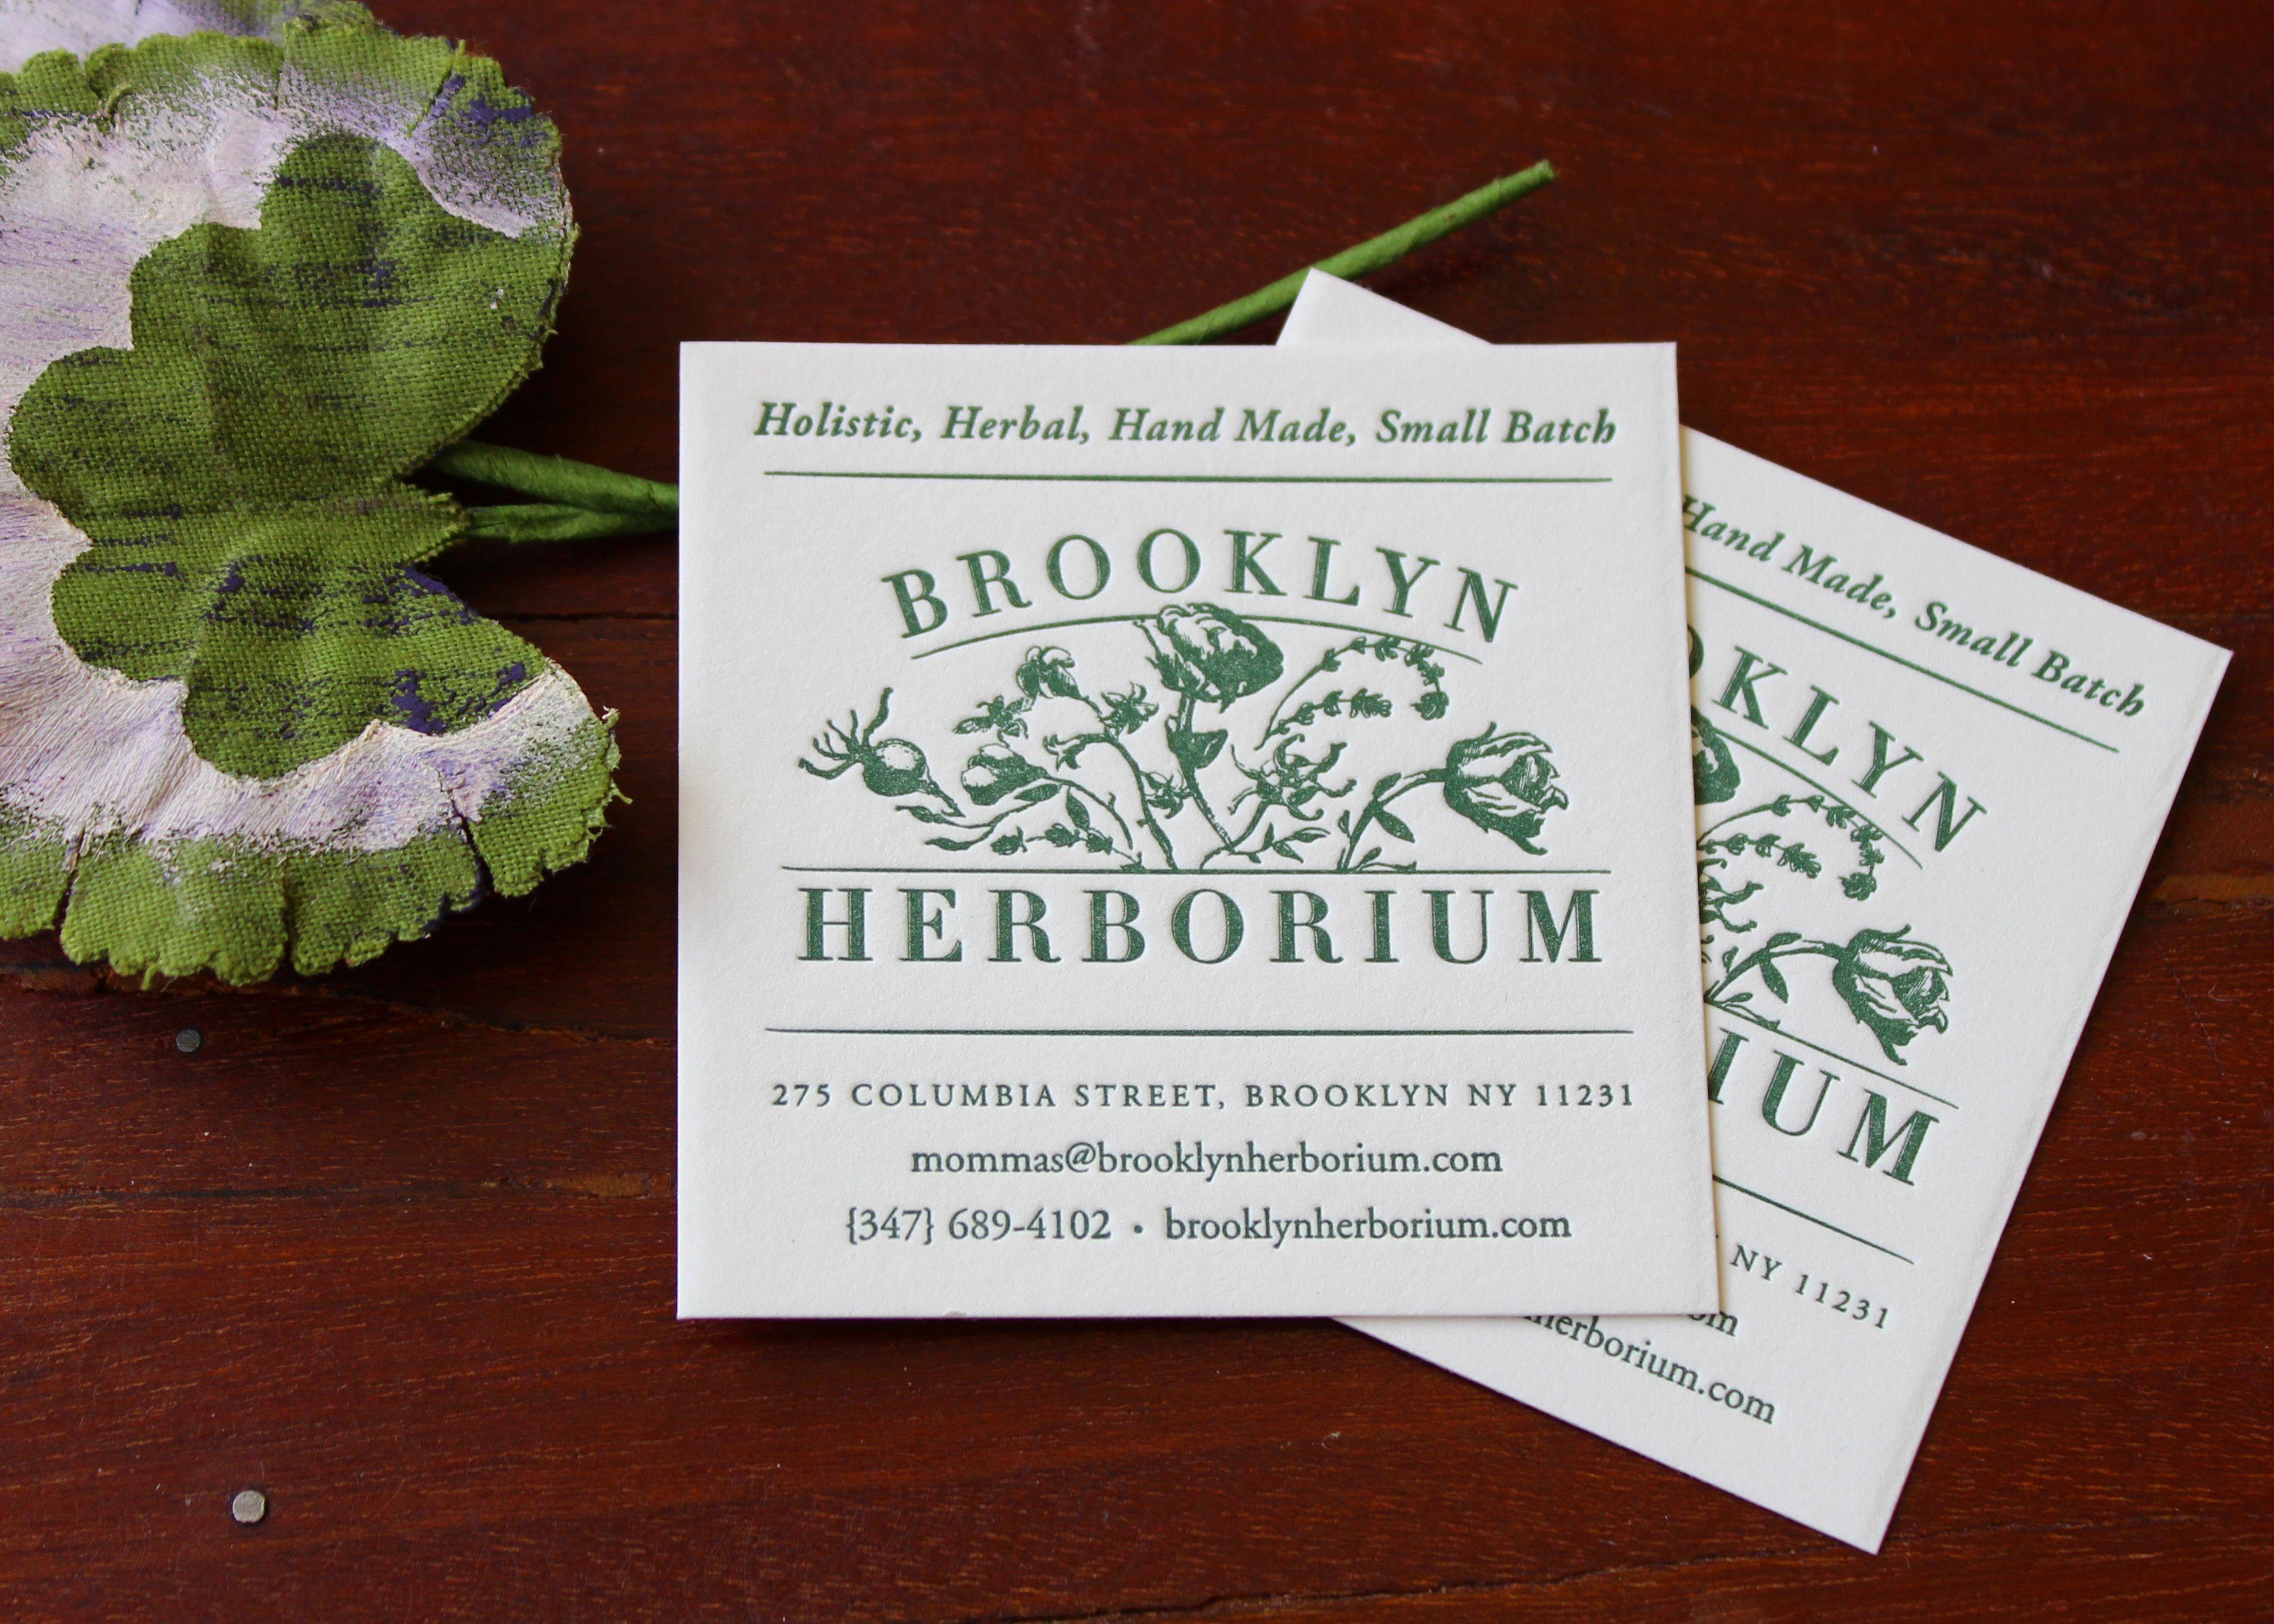 Brooklyn herborium business cards we love how the logo and color brooklyn herborium business cards we love how the logo and color comes out in letterpress reheart Gallery